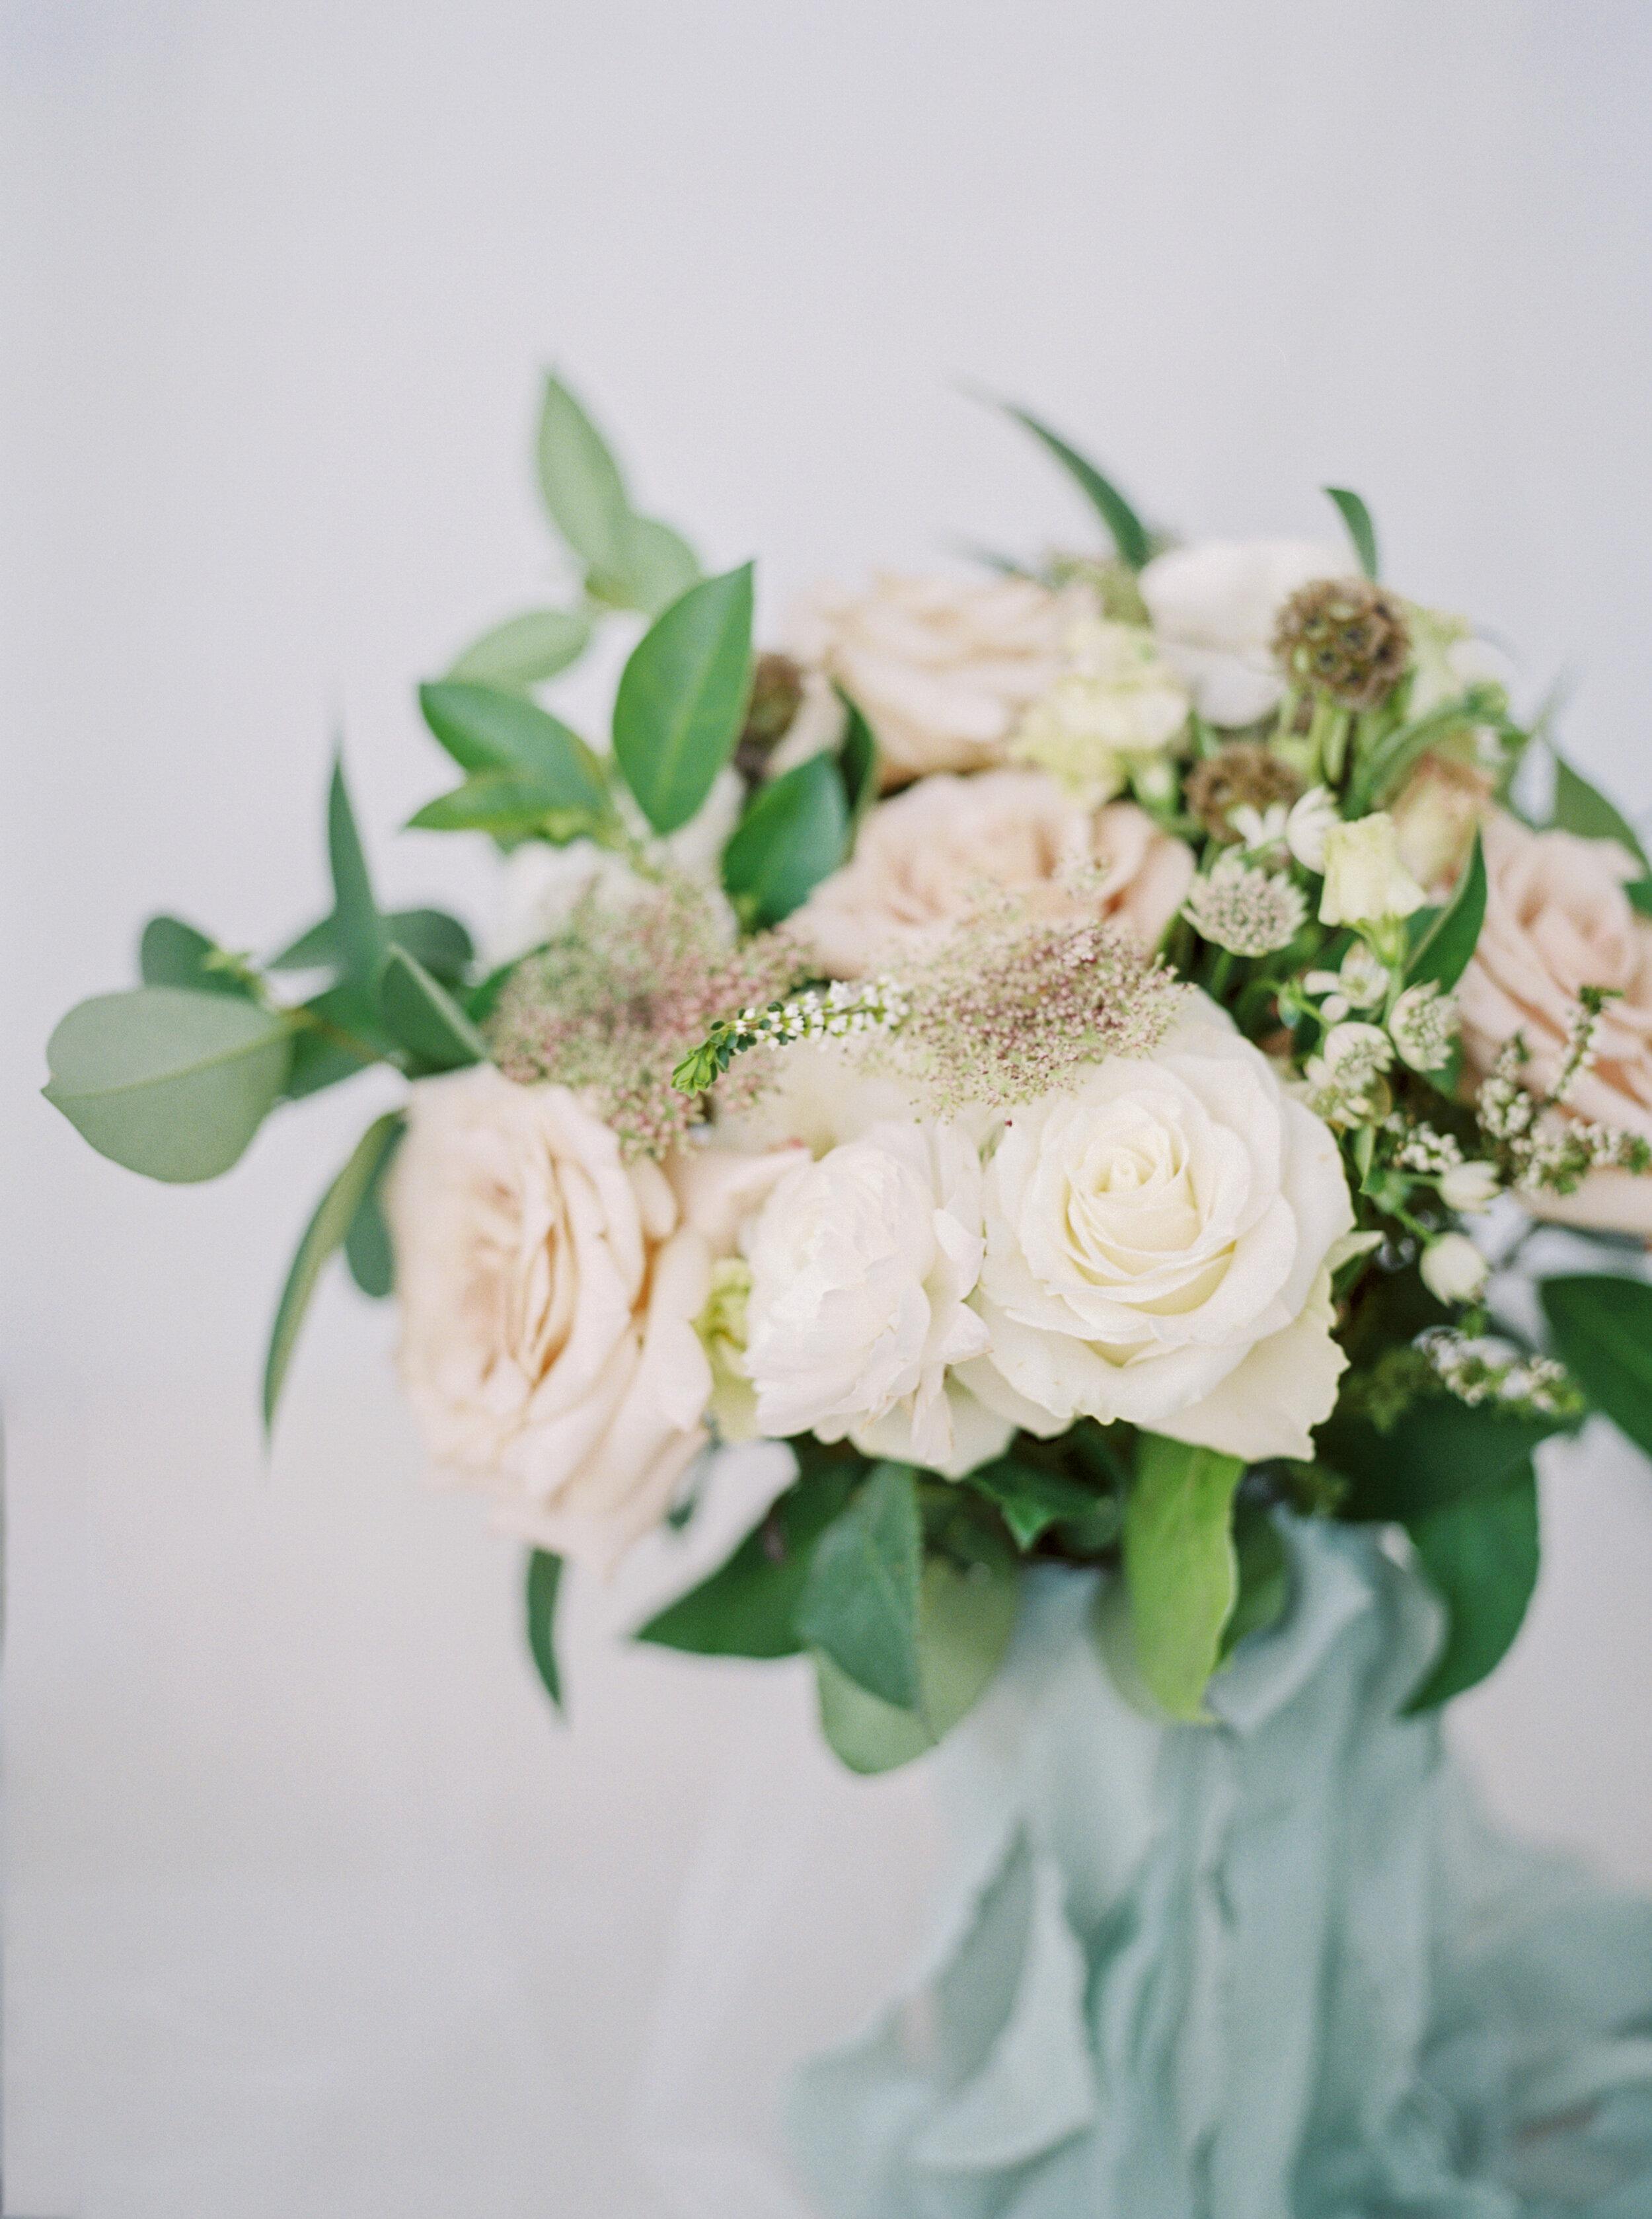 Bibb_Mill_Wedding_Editorial_Columbus_Georgia_Fallen_Photography_2-20.JPG